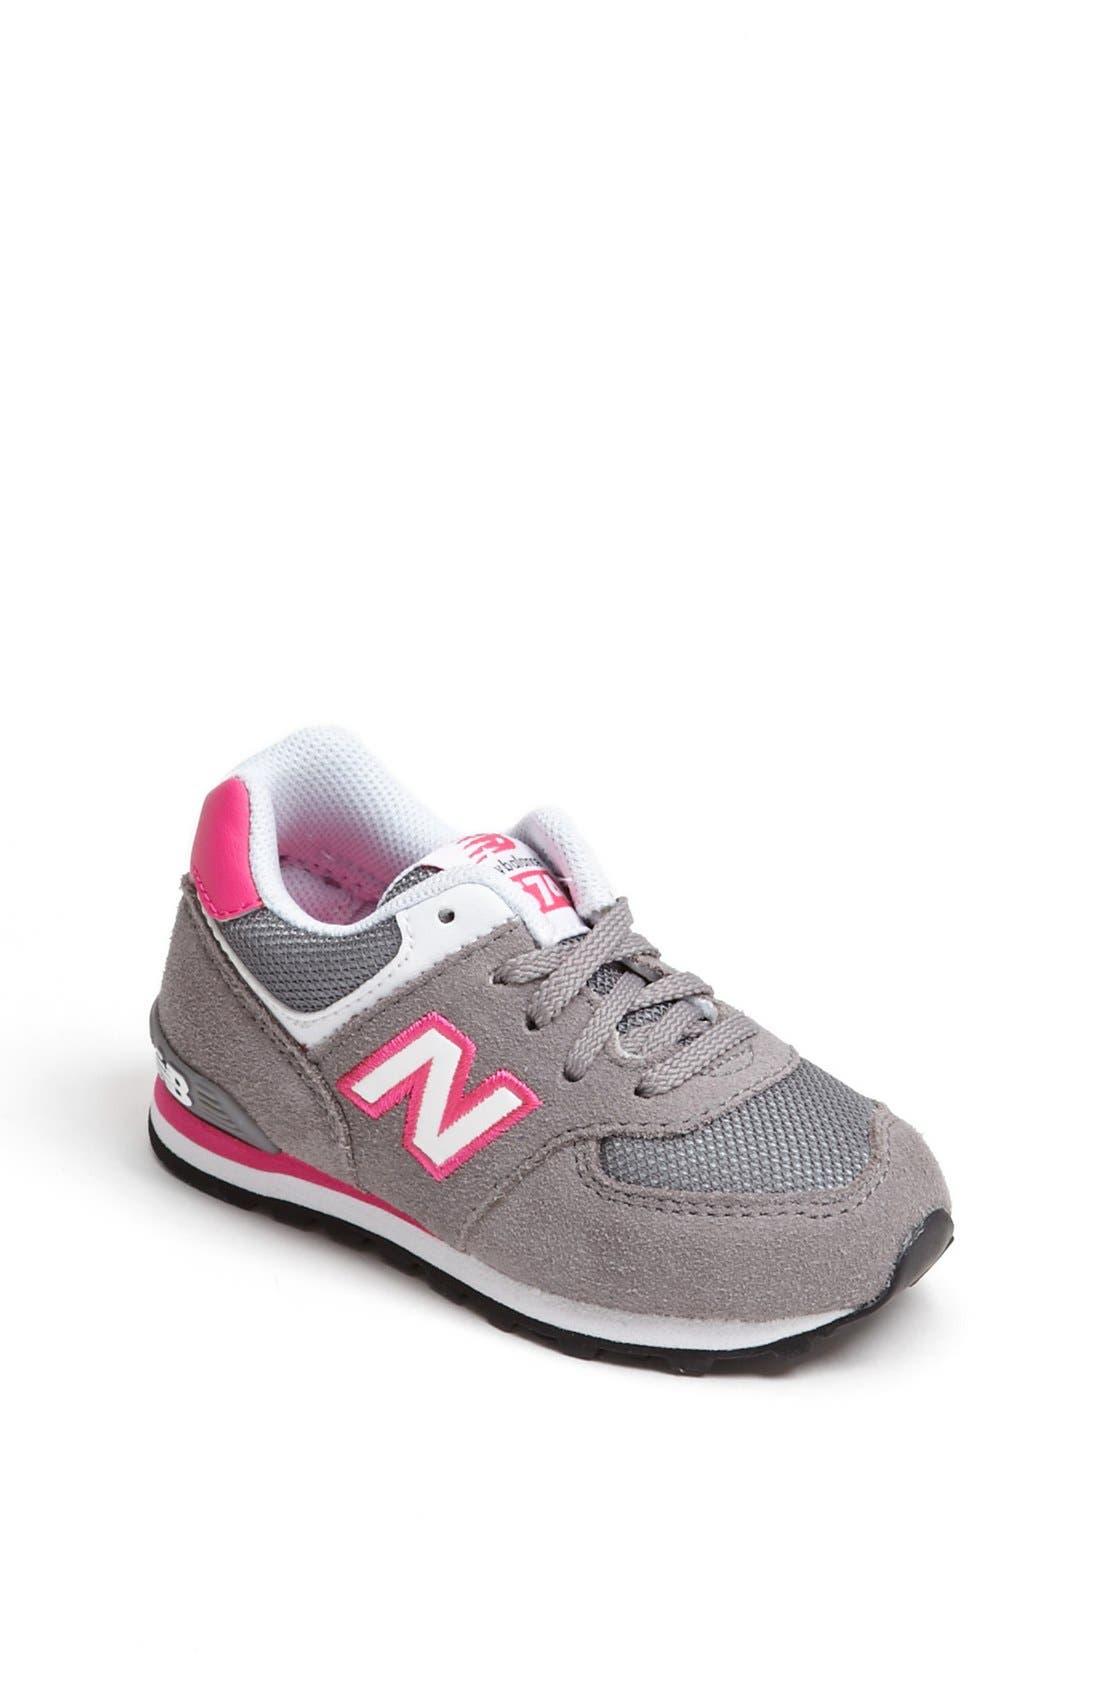 Alternate Image 1 Selected - New Balance '574' Running Shoe (Baby, Walker & Toddler)